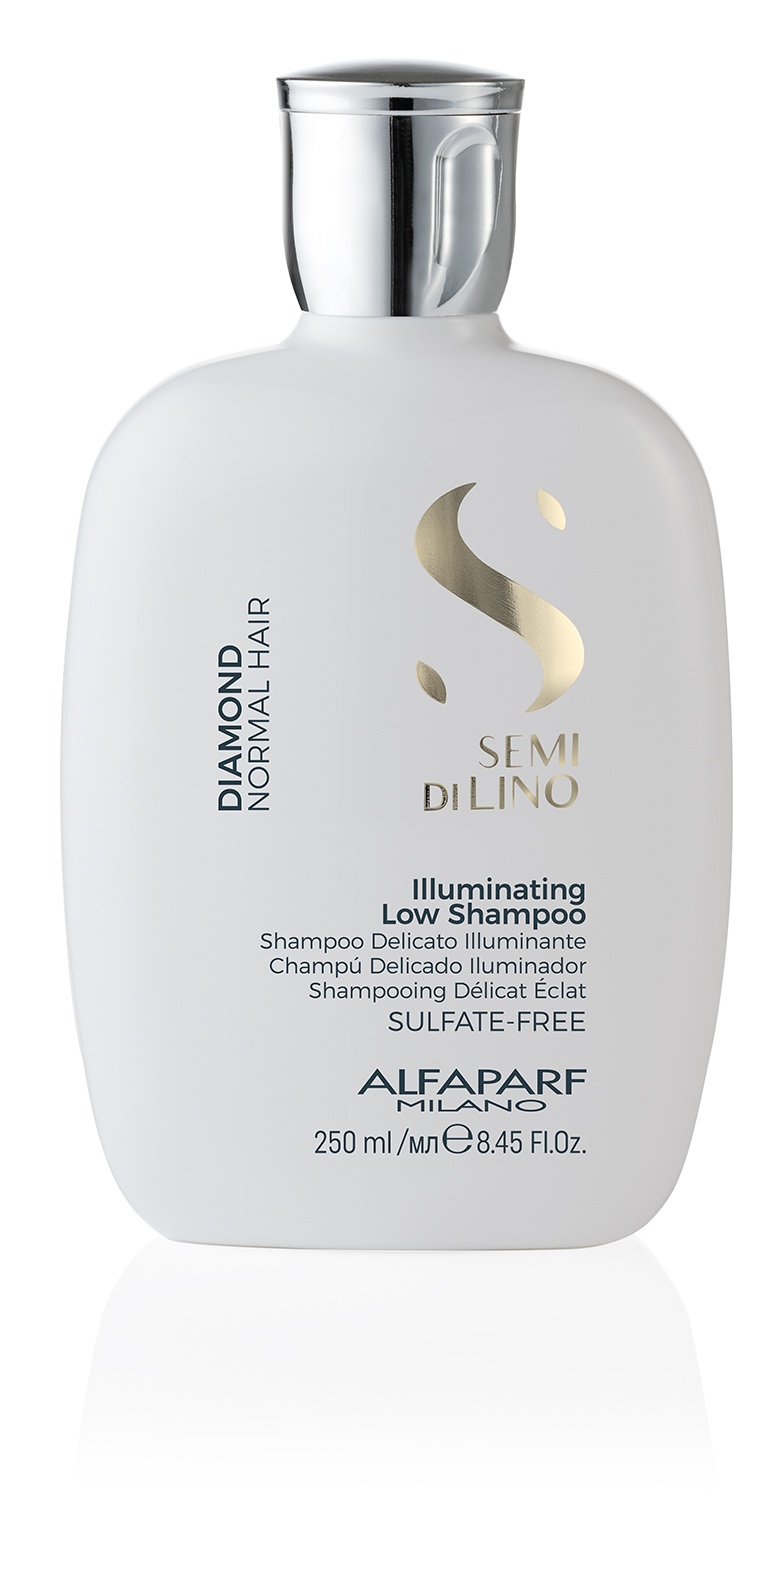 ILLUMINATING LOW SHAMPOO    DESCRIPTION   Cleanses and illuminates Revitalises  SULFATE FREE LIGHTNESS    FORMAT   Bottle 250ml